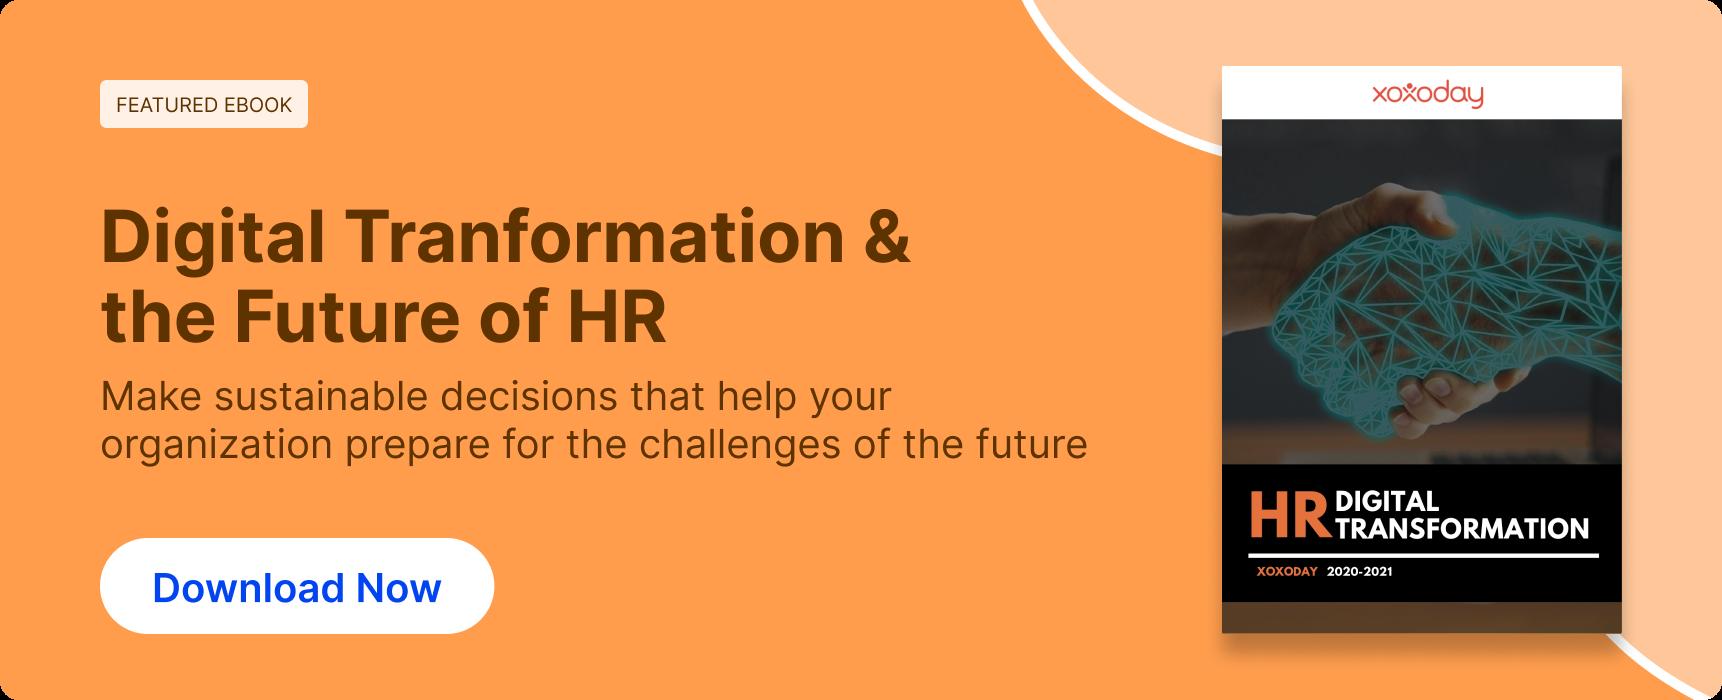 Guide to HR Digital Transformation